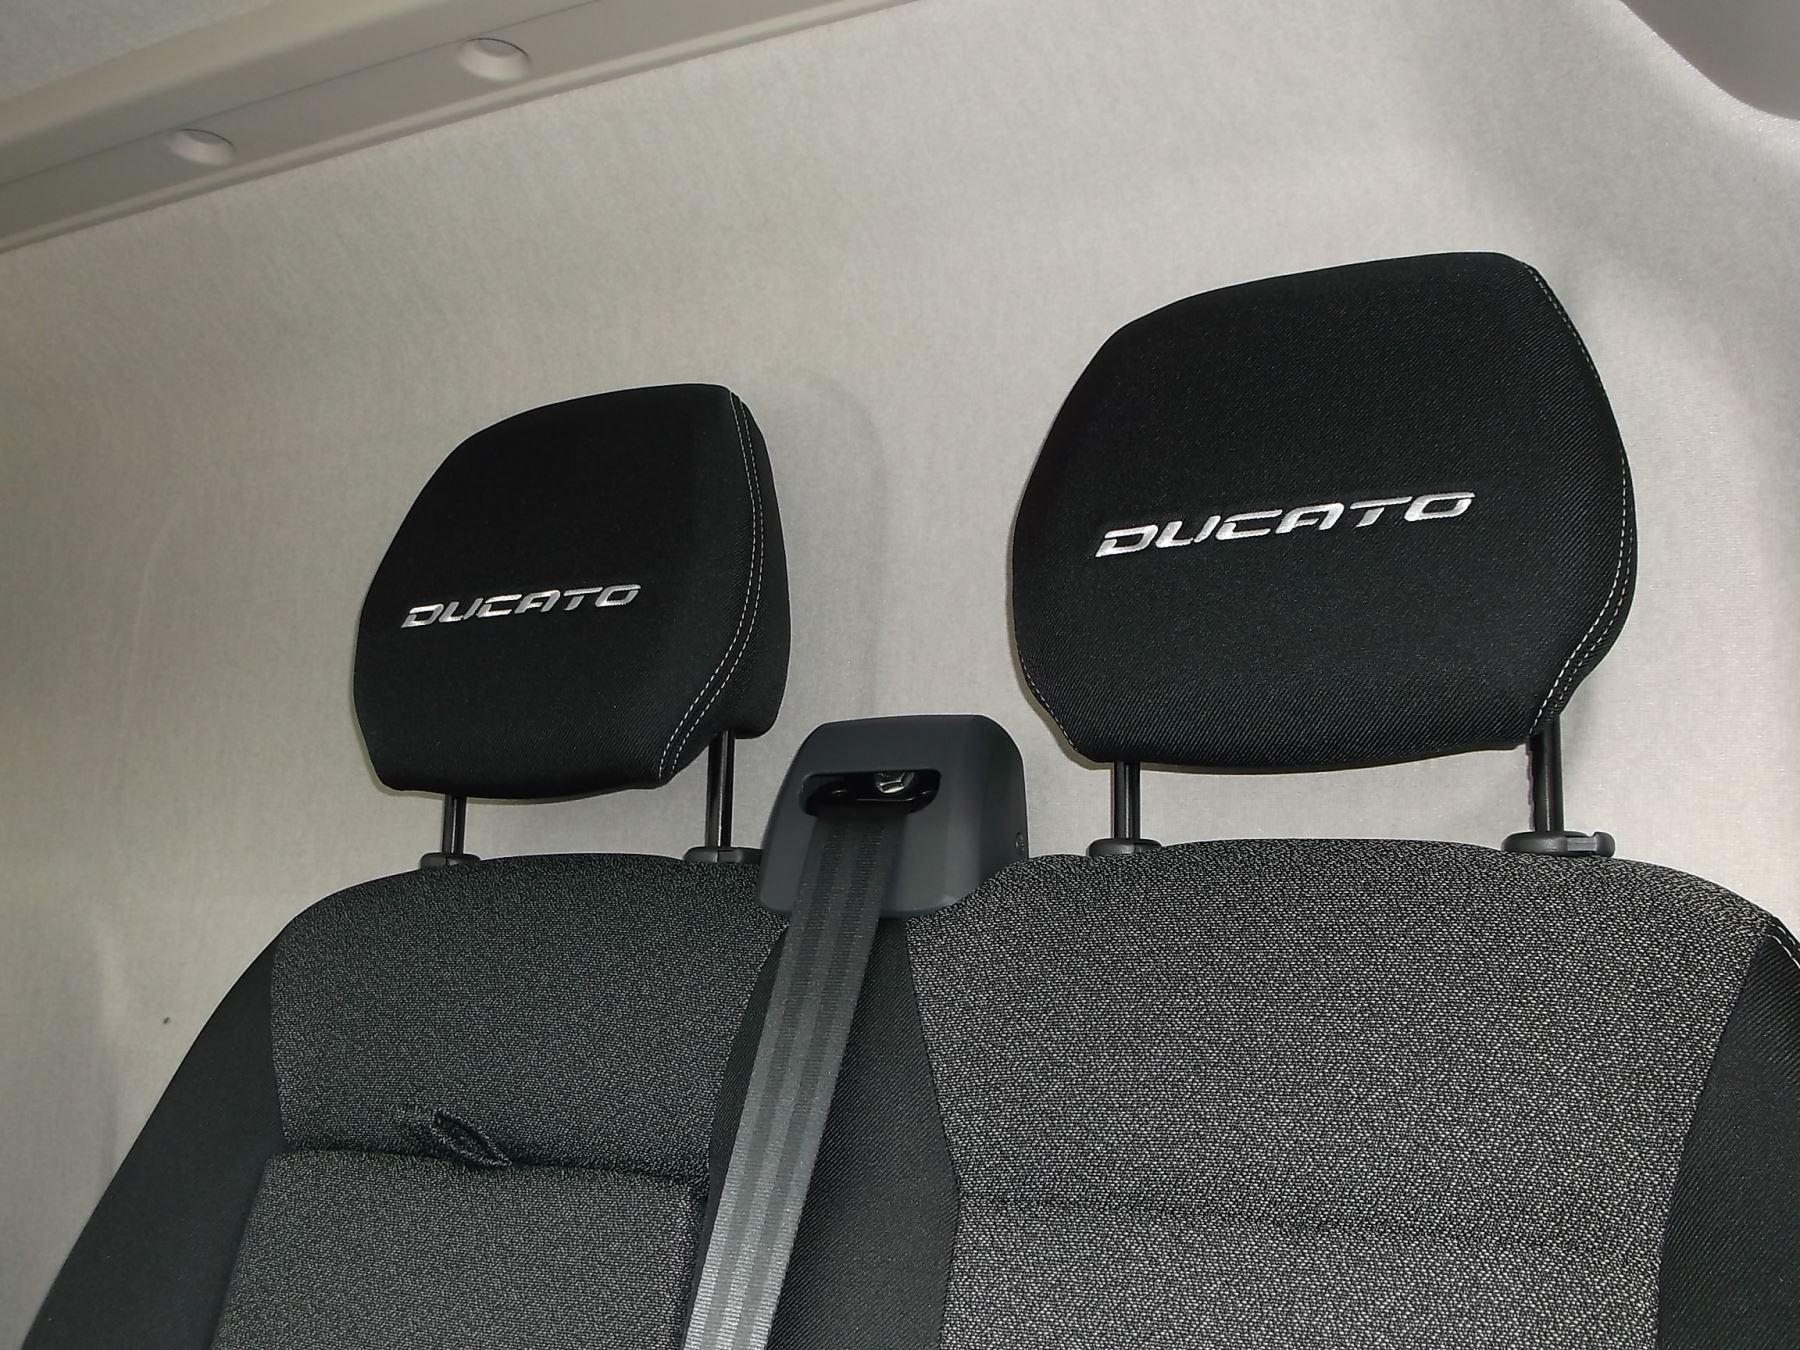 Fiat Ducato MWB HR 2.3 160 SPORTIVO MY20 ALLOYS CLR CODED LED  AIRCON NAV CRUISE REV SENSORS CAMERA image 13